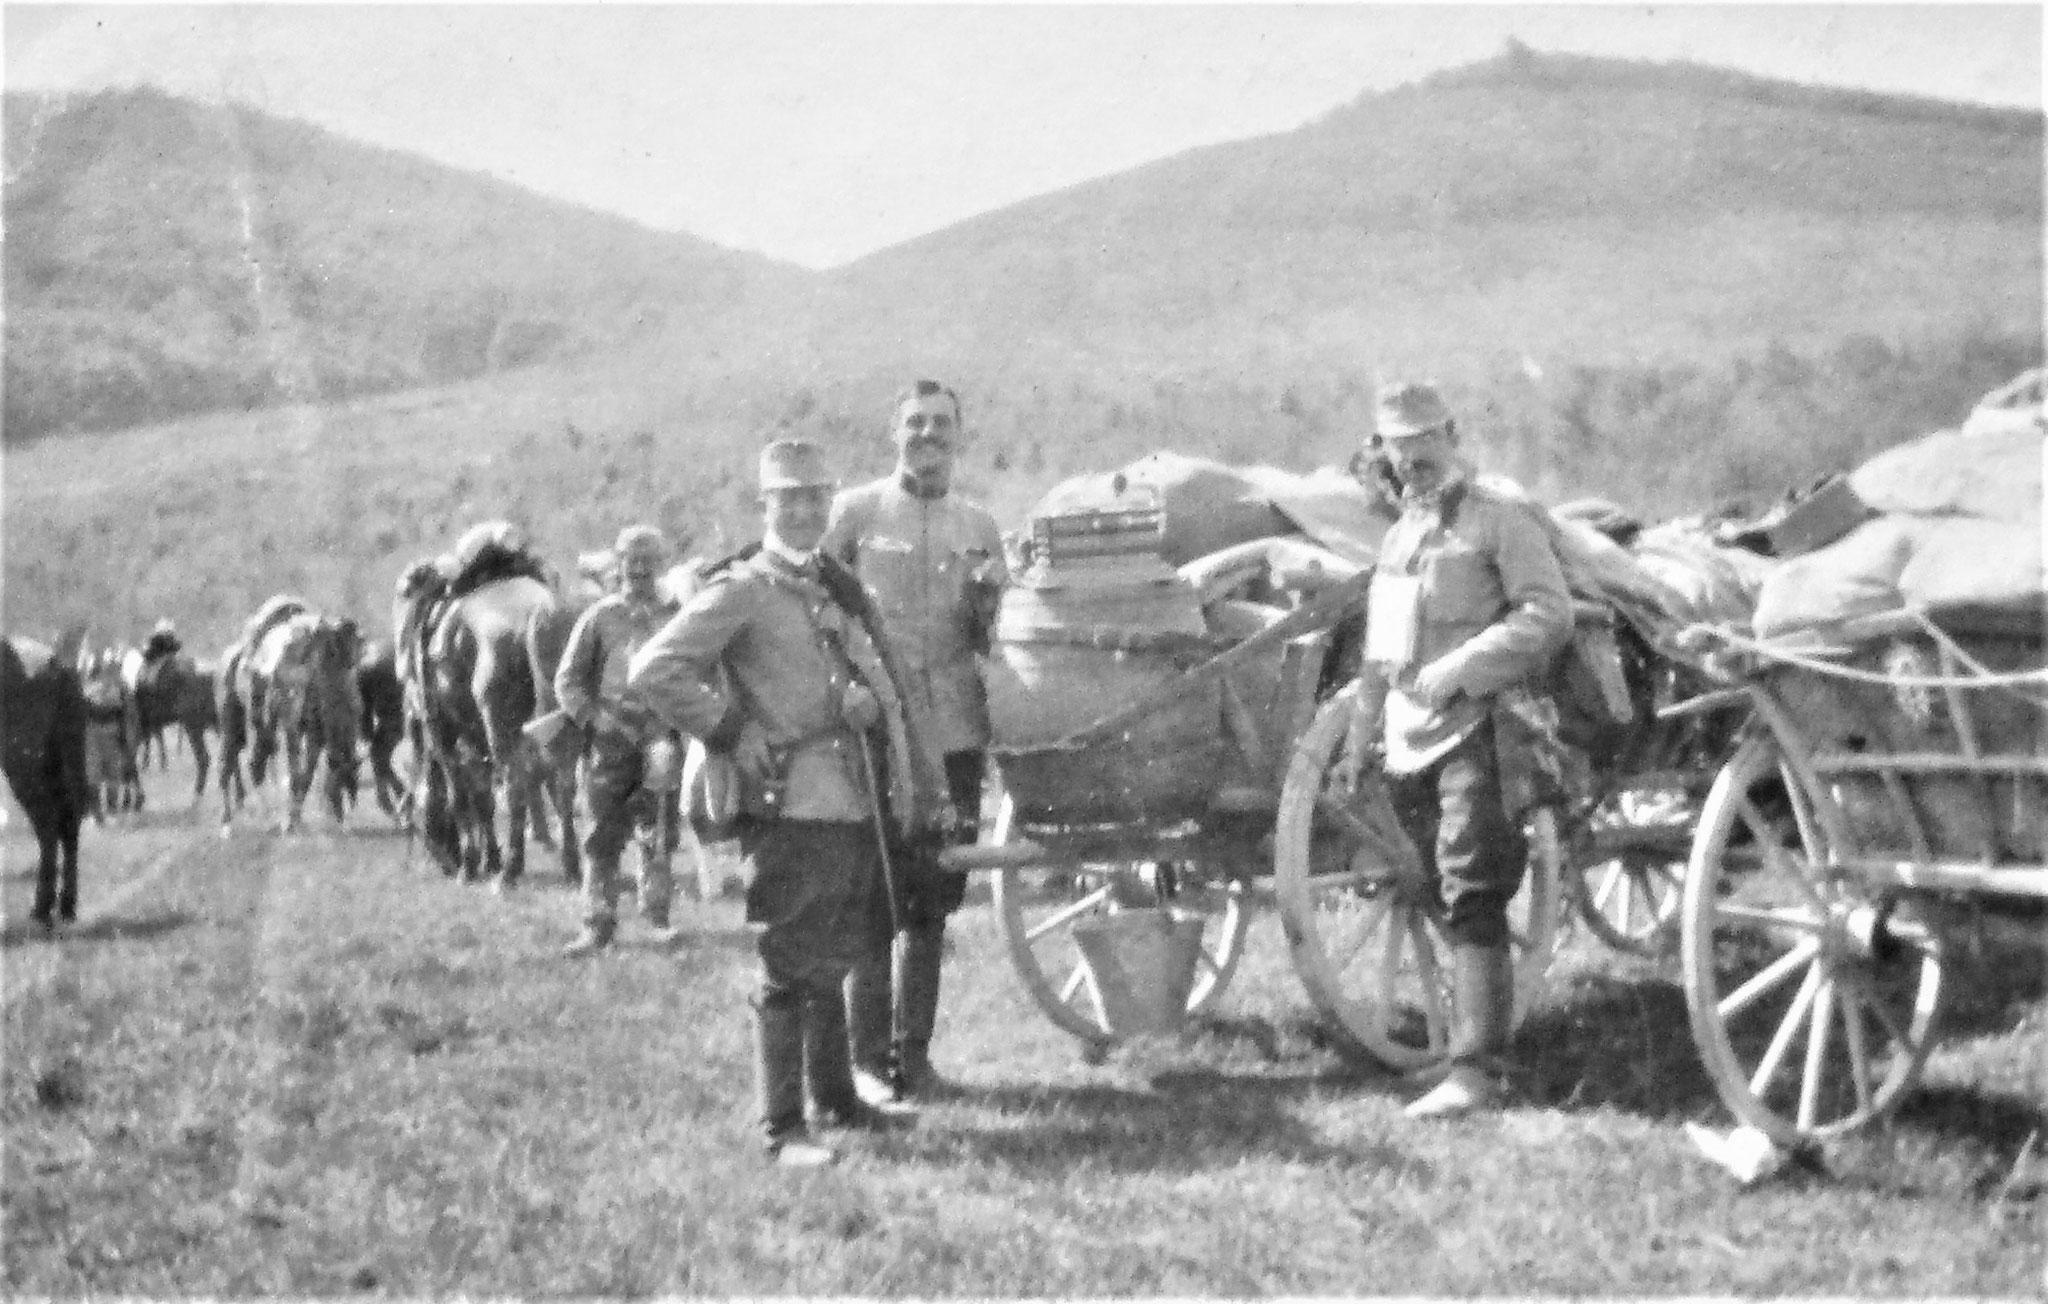 Mai 1915, bei Felsö – Vizköz. Links neben ihm: Max Kirchbach und RUO Stanz.